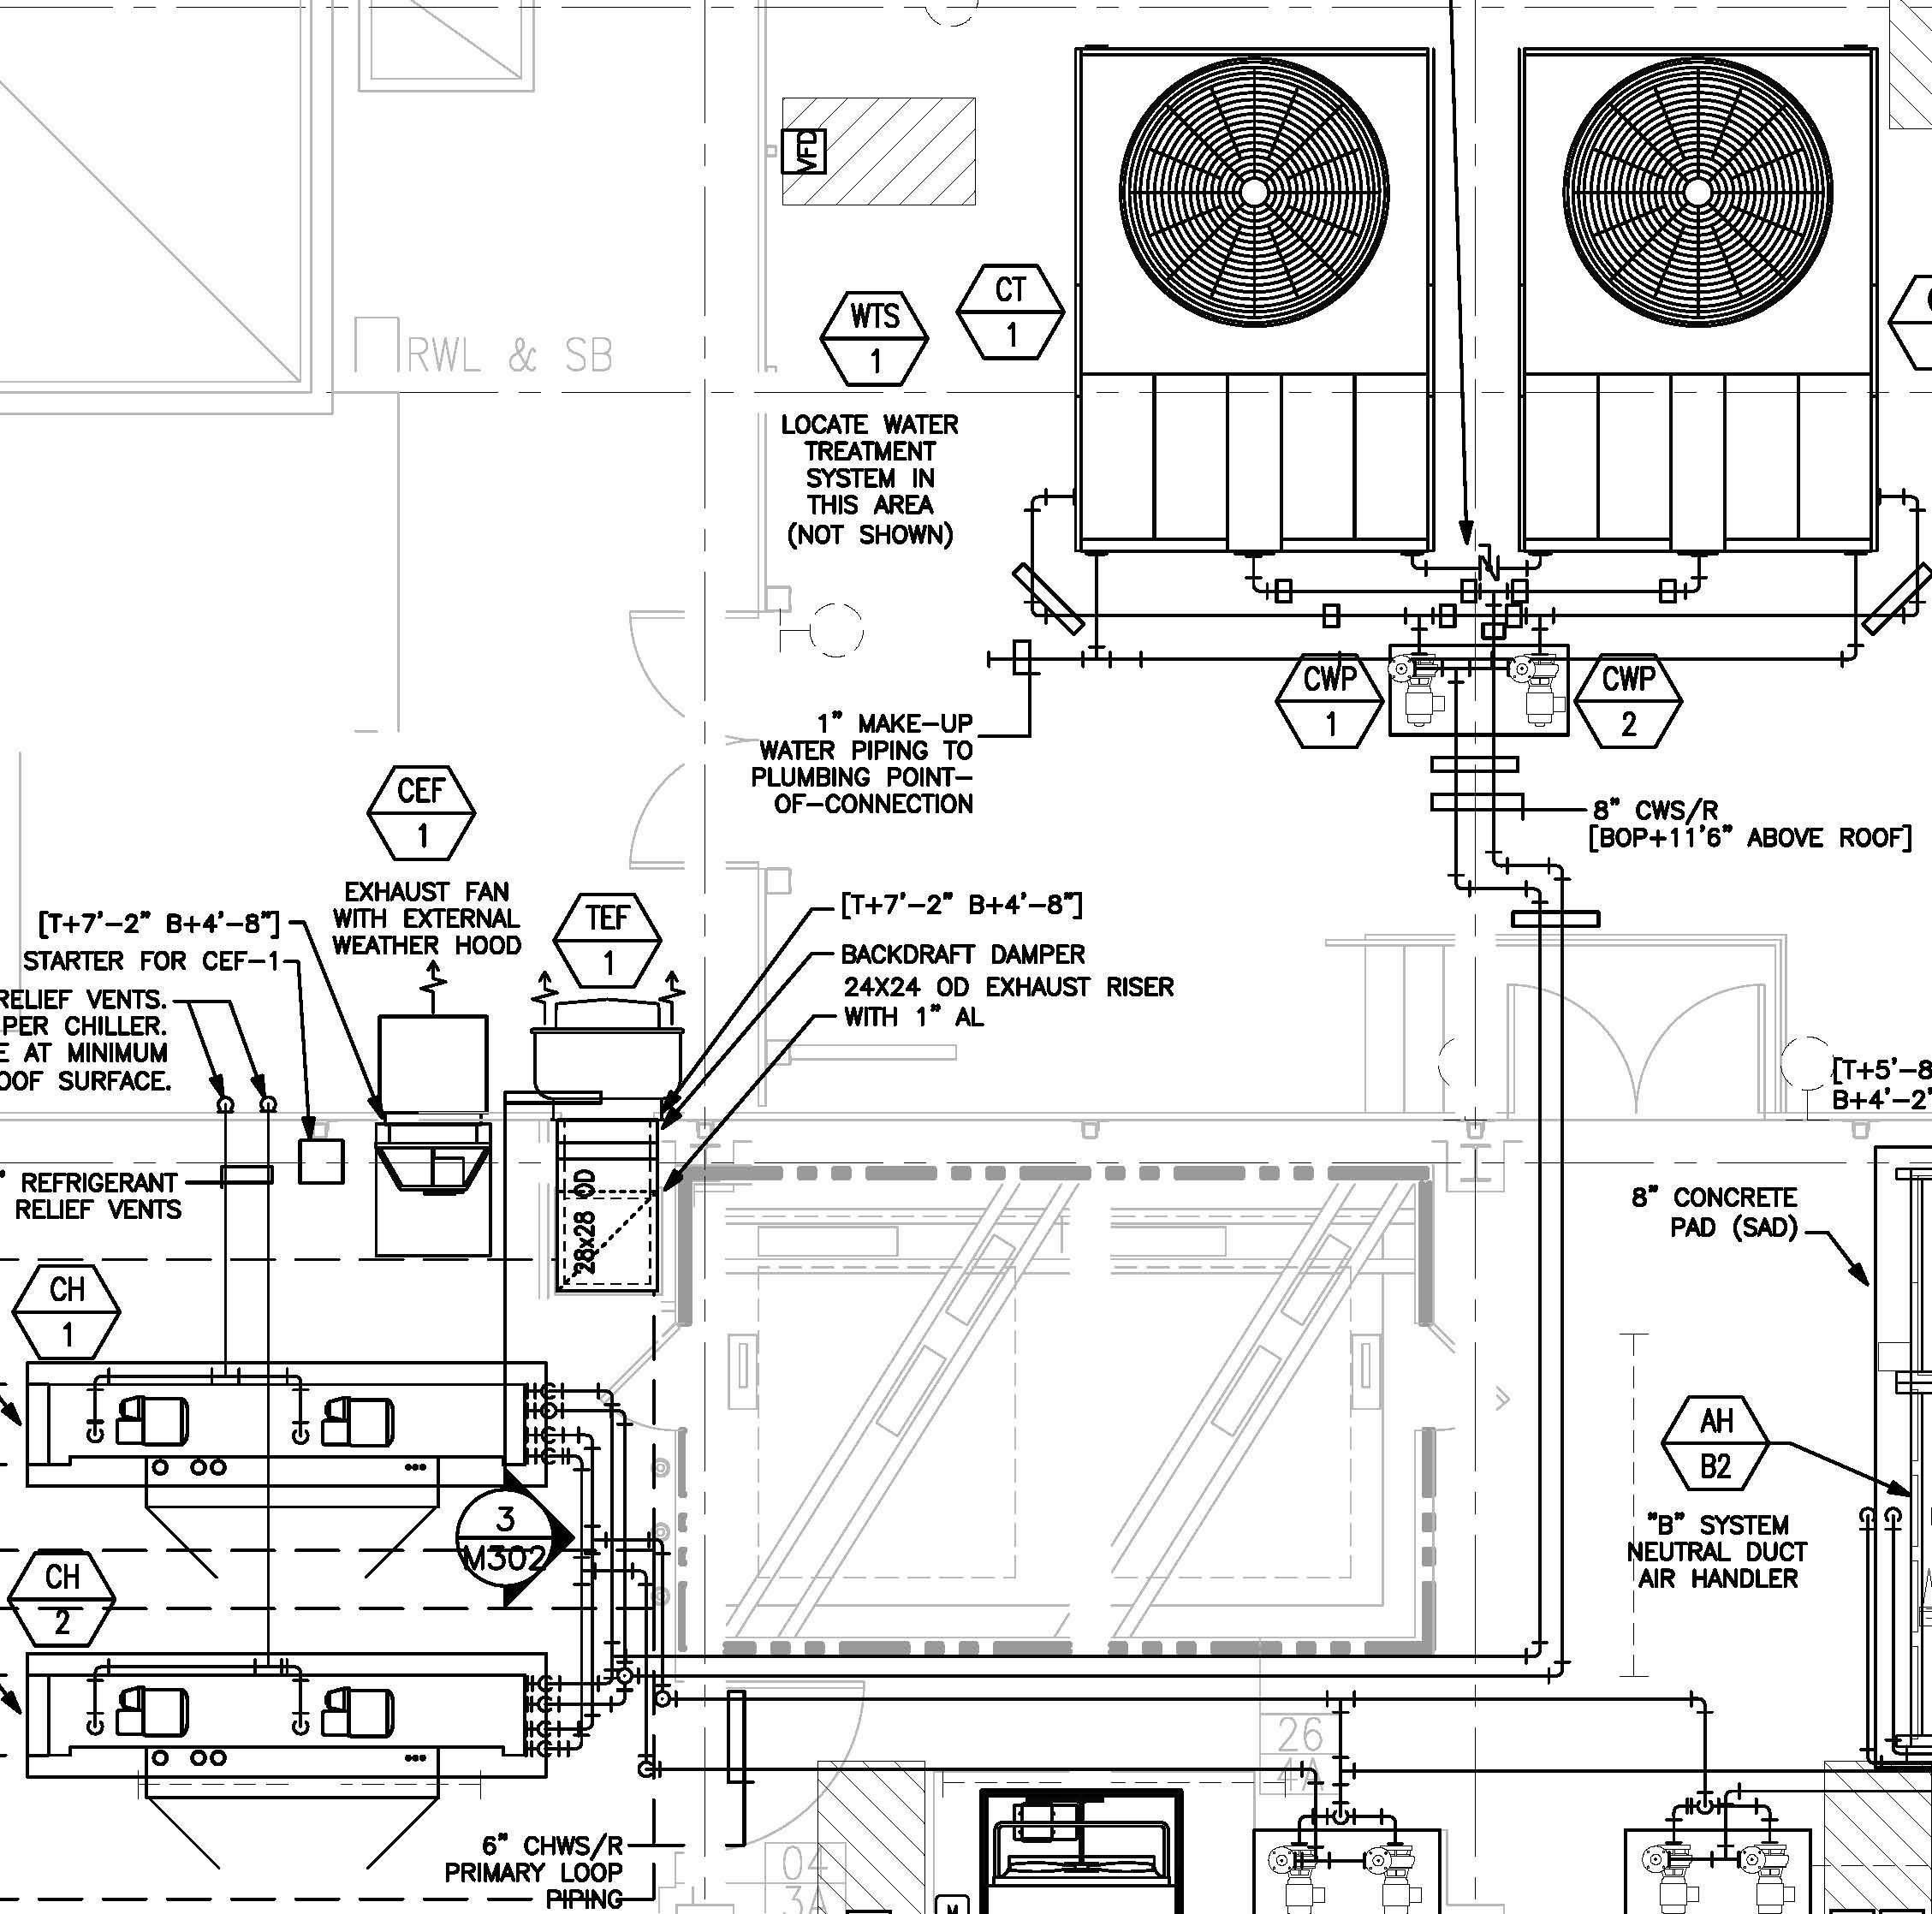 Carrier Heat Pump thermostat Wiring Diagram Carrier Hvac thermostat Wiring Diagram Inspirational Payne Gas Of Carrier Heat Pump thermostat Wiring Diagram